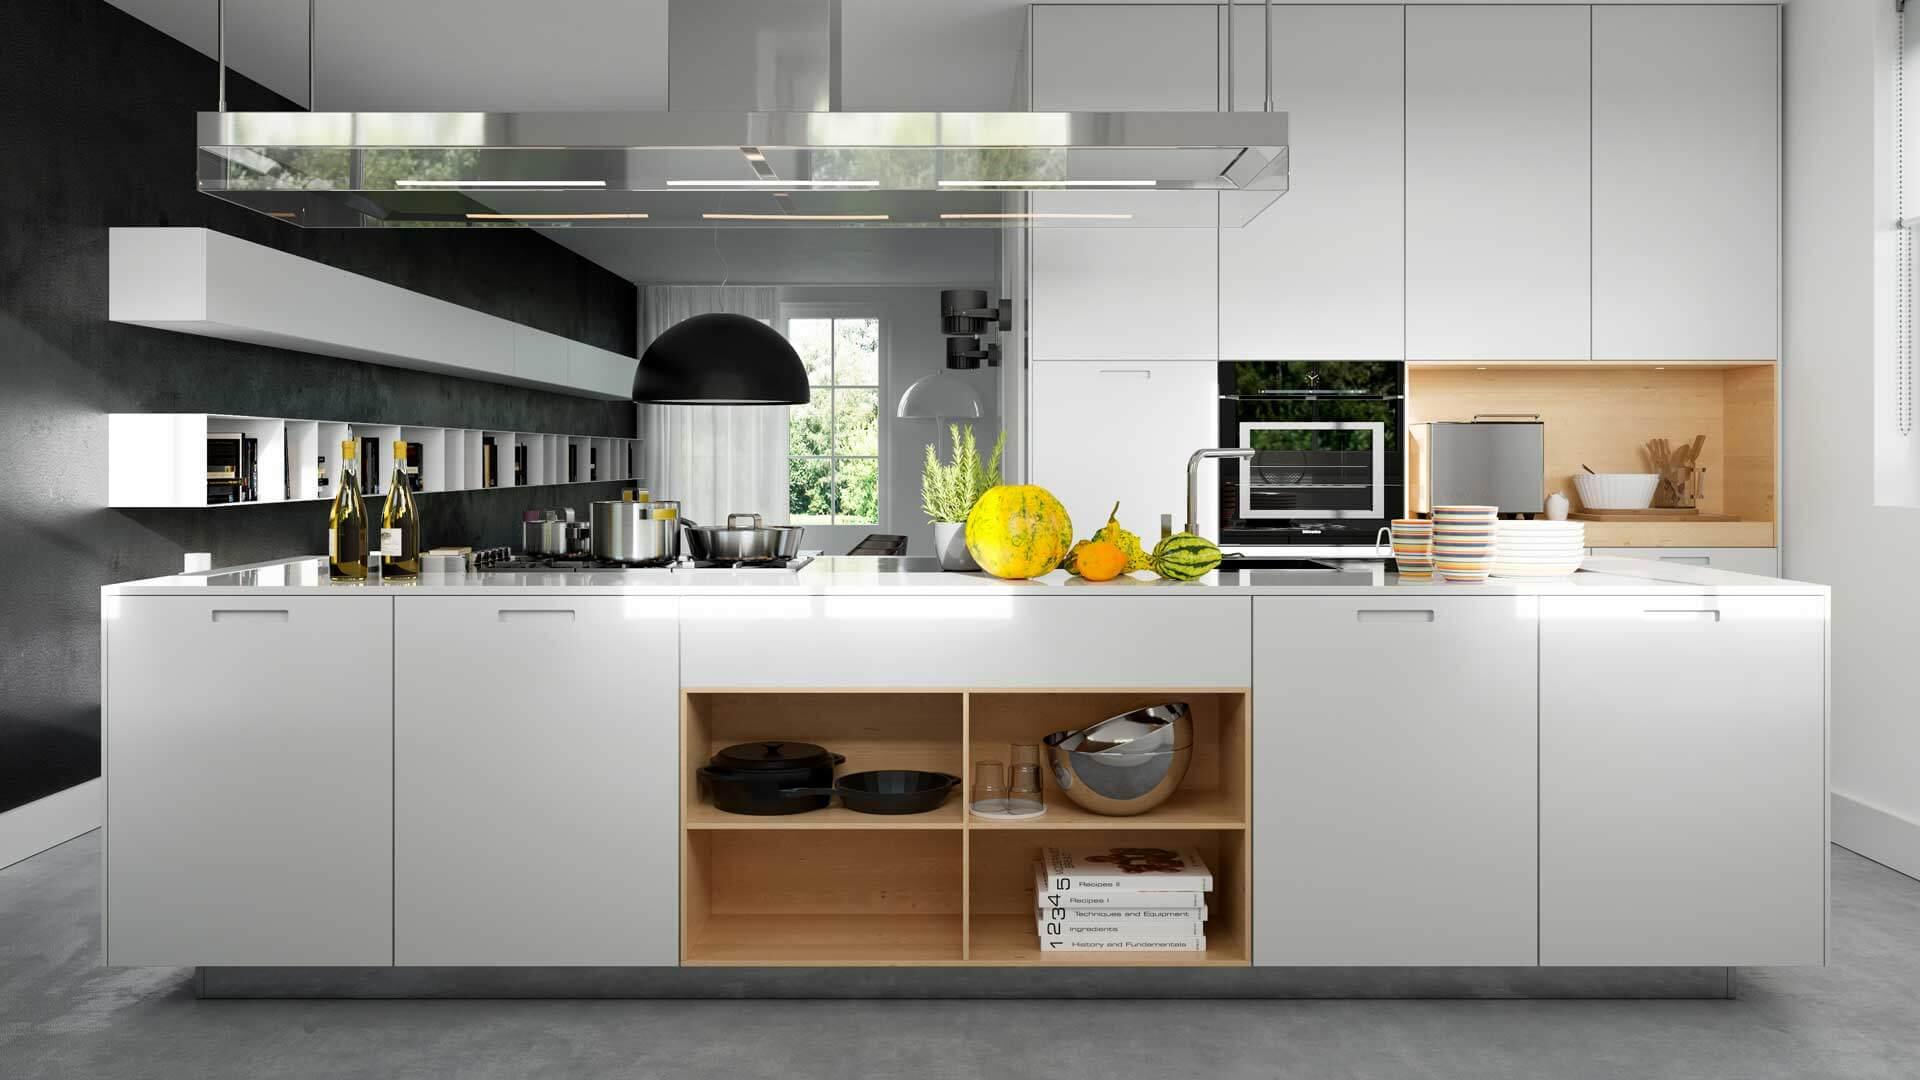 Mossenest2-Werk-yoreM-Nieuwbouwwoning